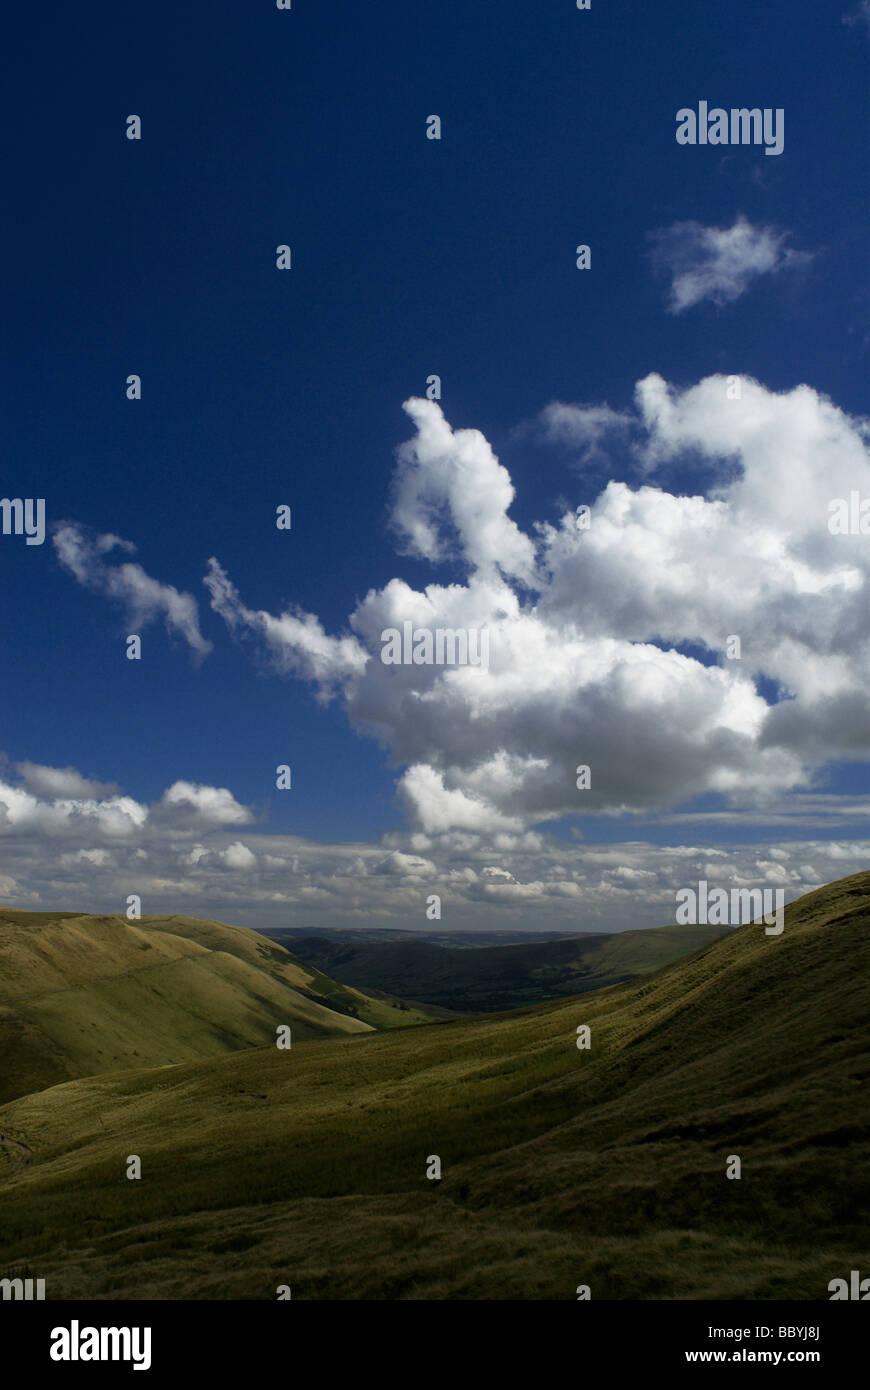 Upland landscape under blue sky and clouds - Stock Image